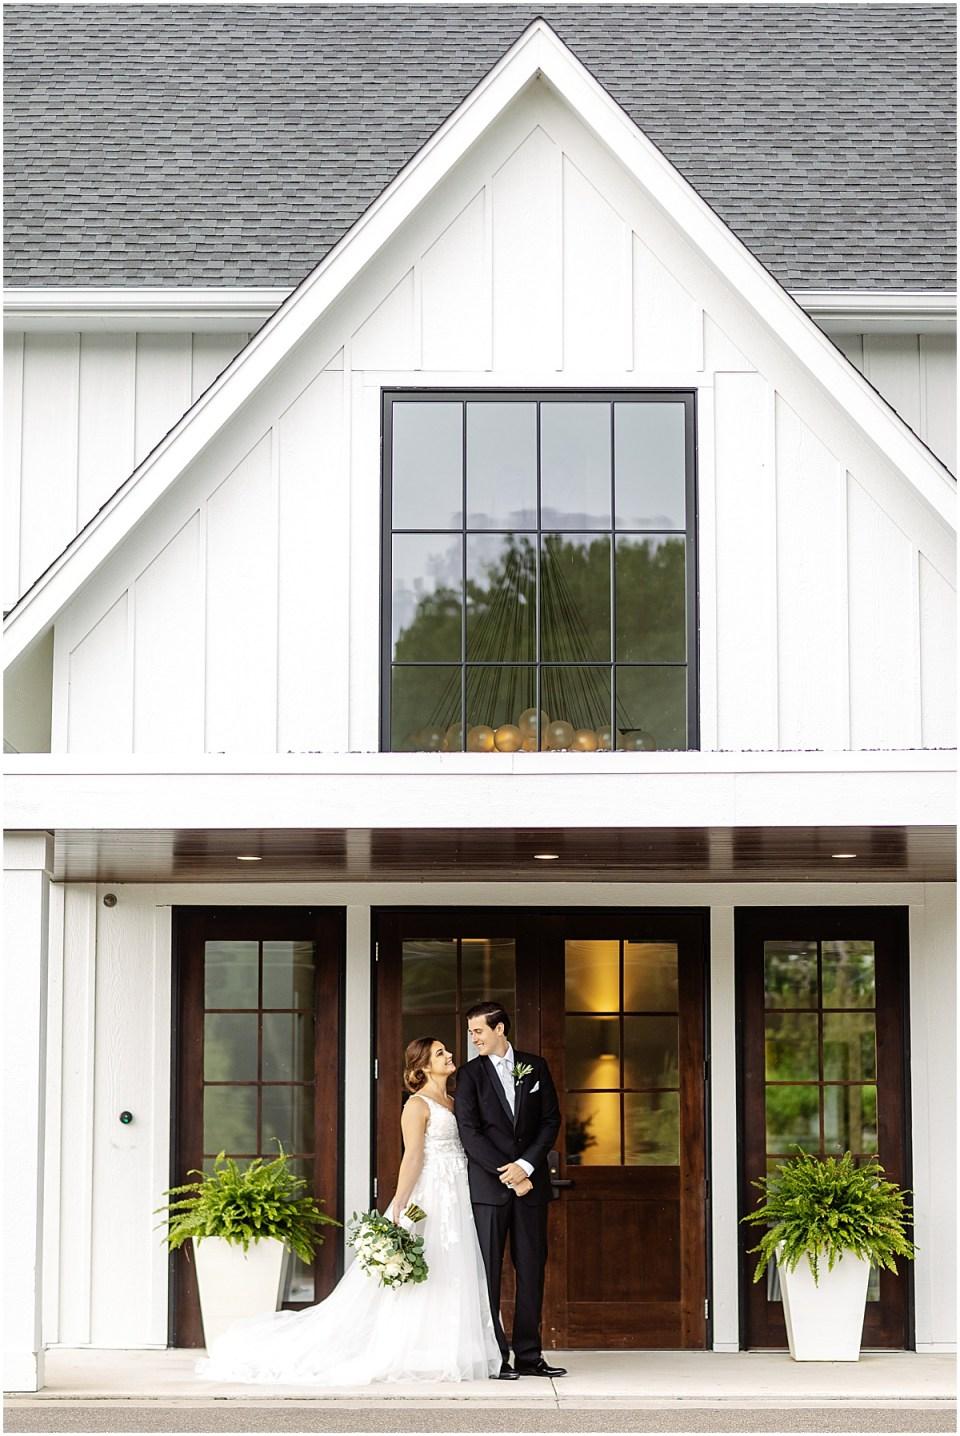 Hutton House Wedding in Summer at Medicine Lake